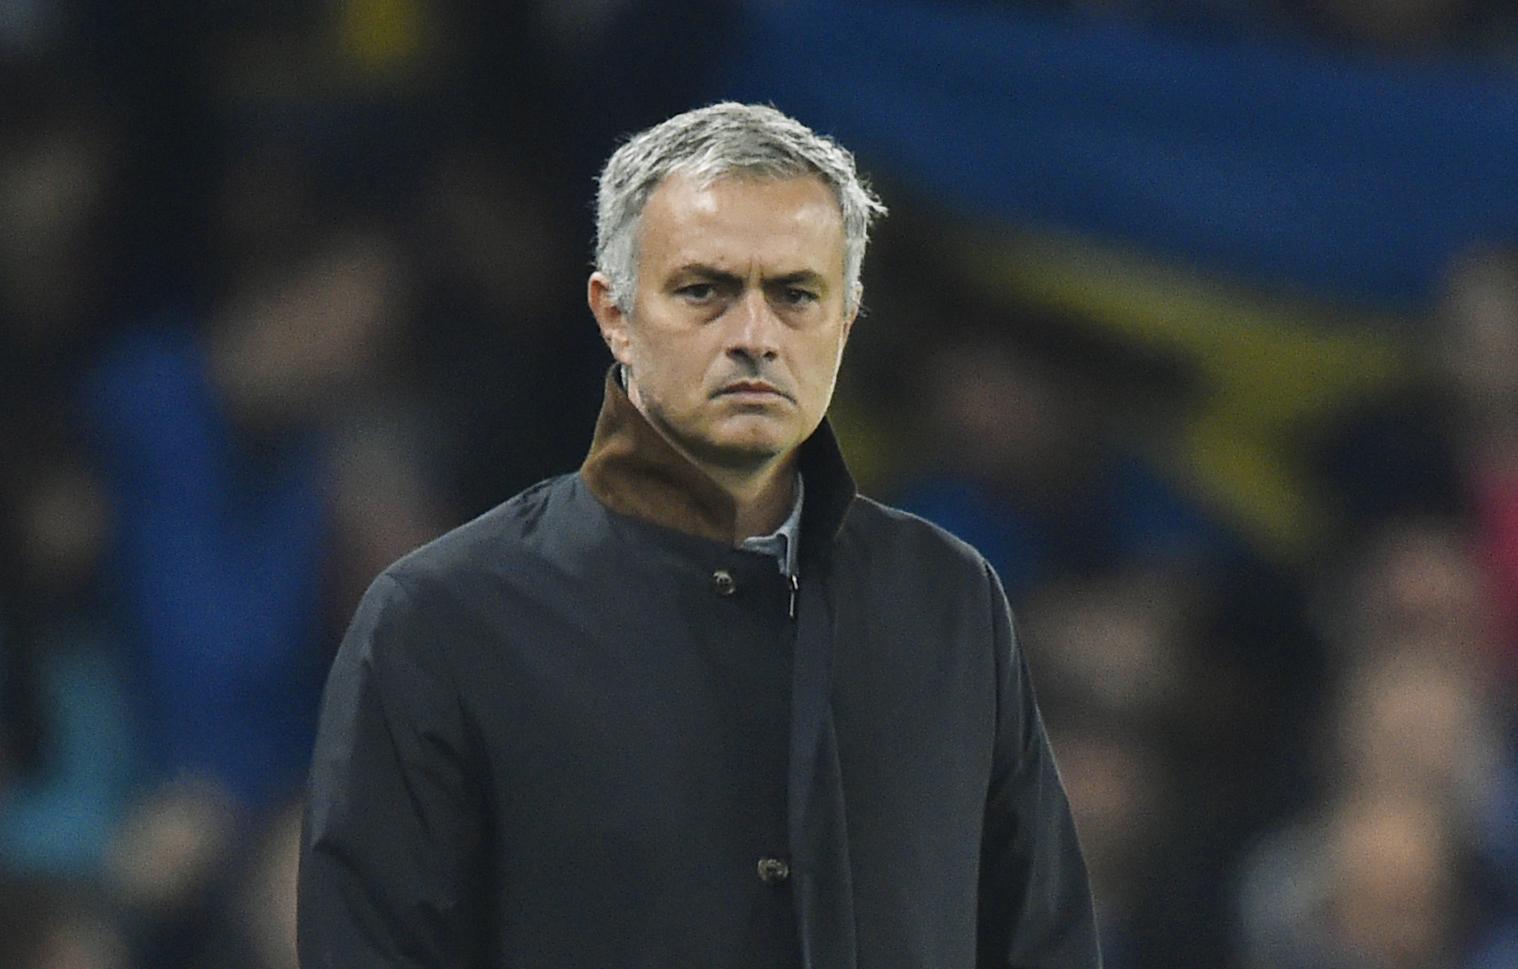 Chelsea manager Jose Mourinho. Photo: Reuters